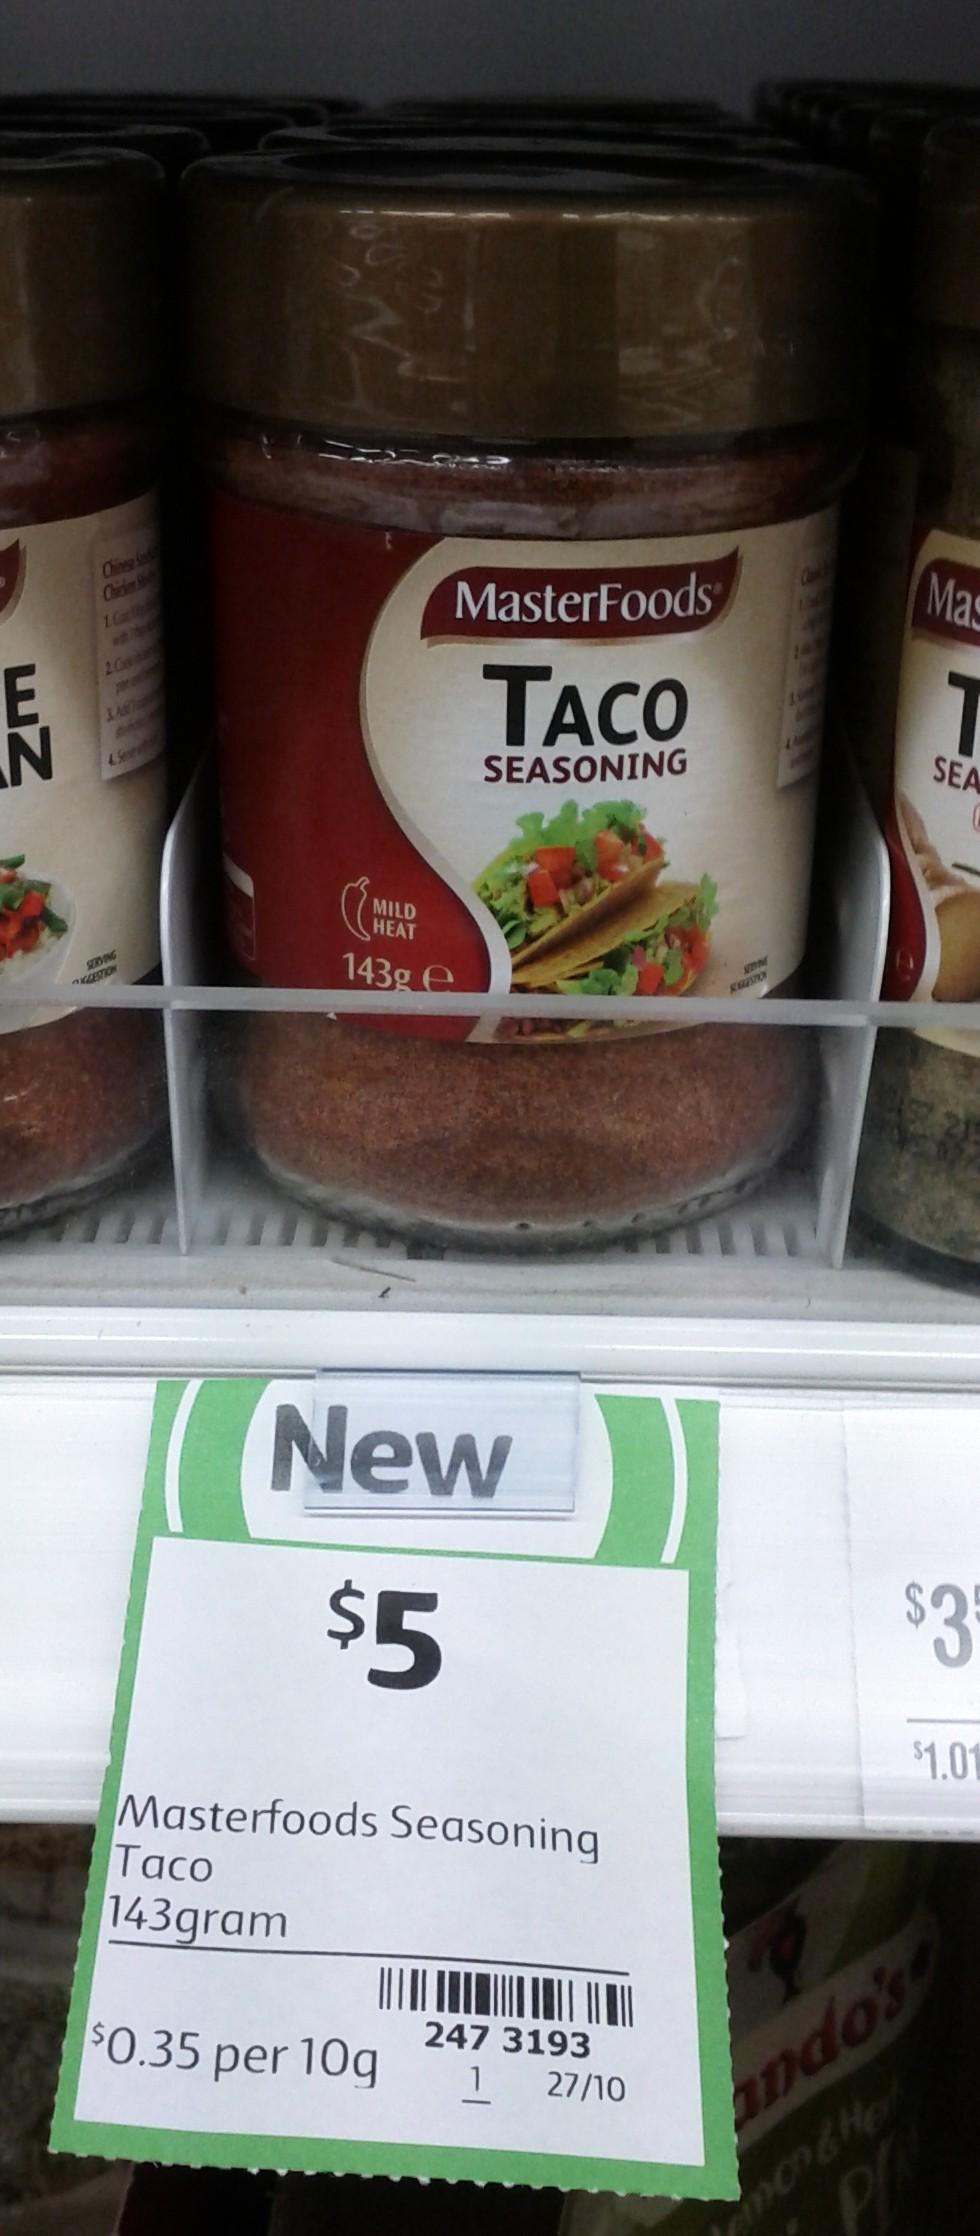 Masterfoods 143g Taco Seasoning